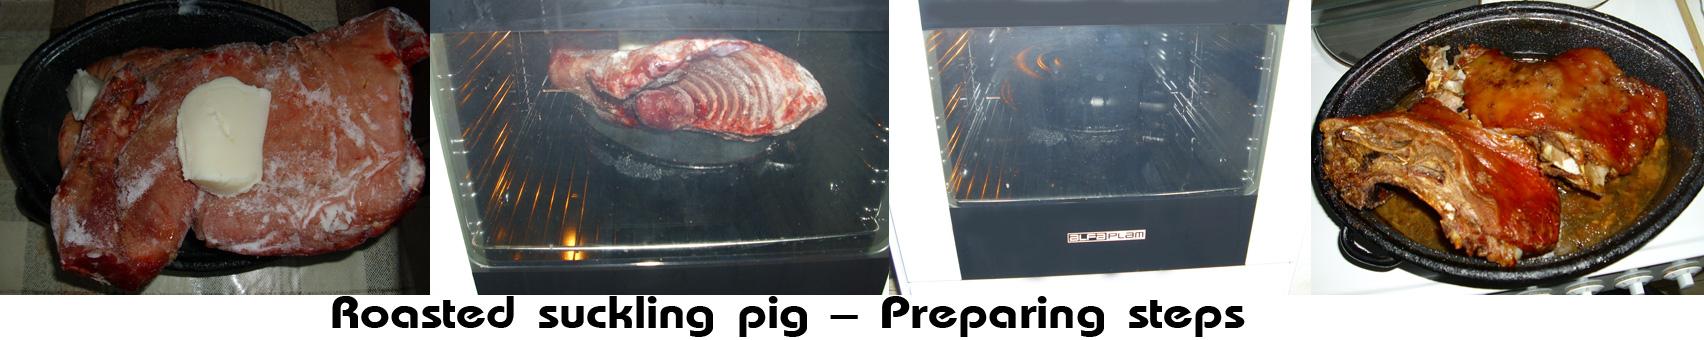 Oven roasted suckling pig (Prasece pecenje u rerni)